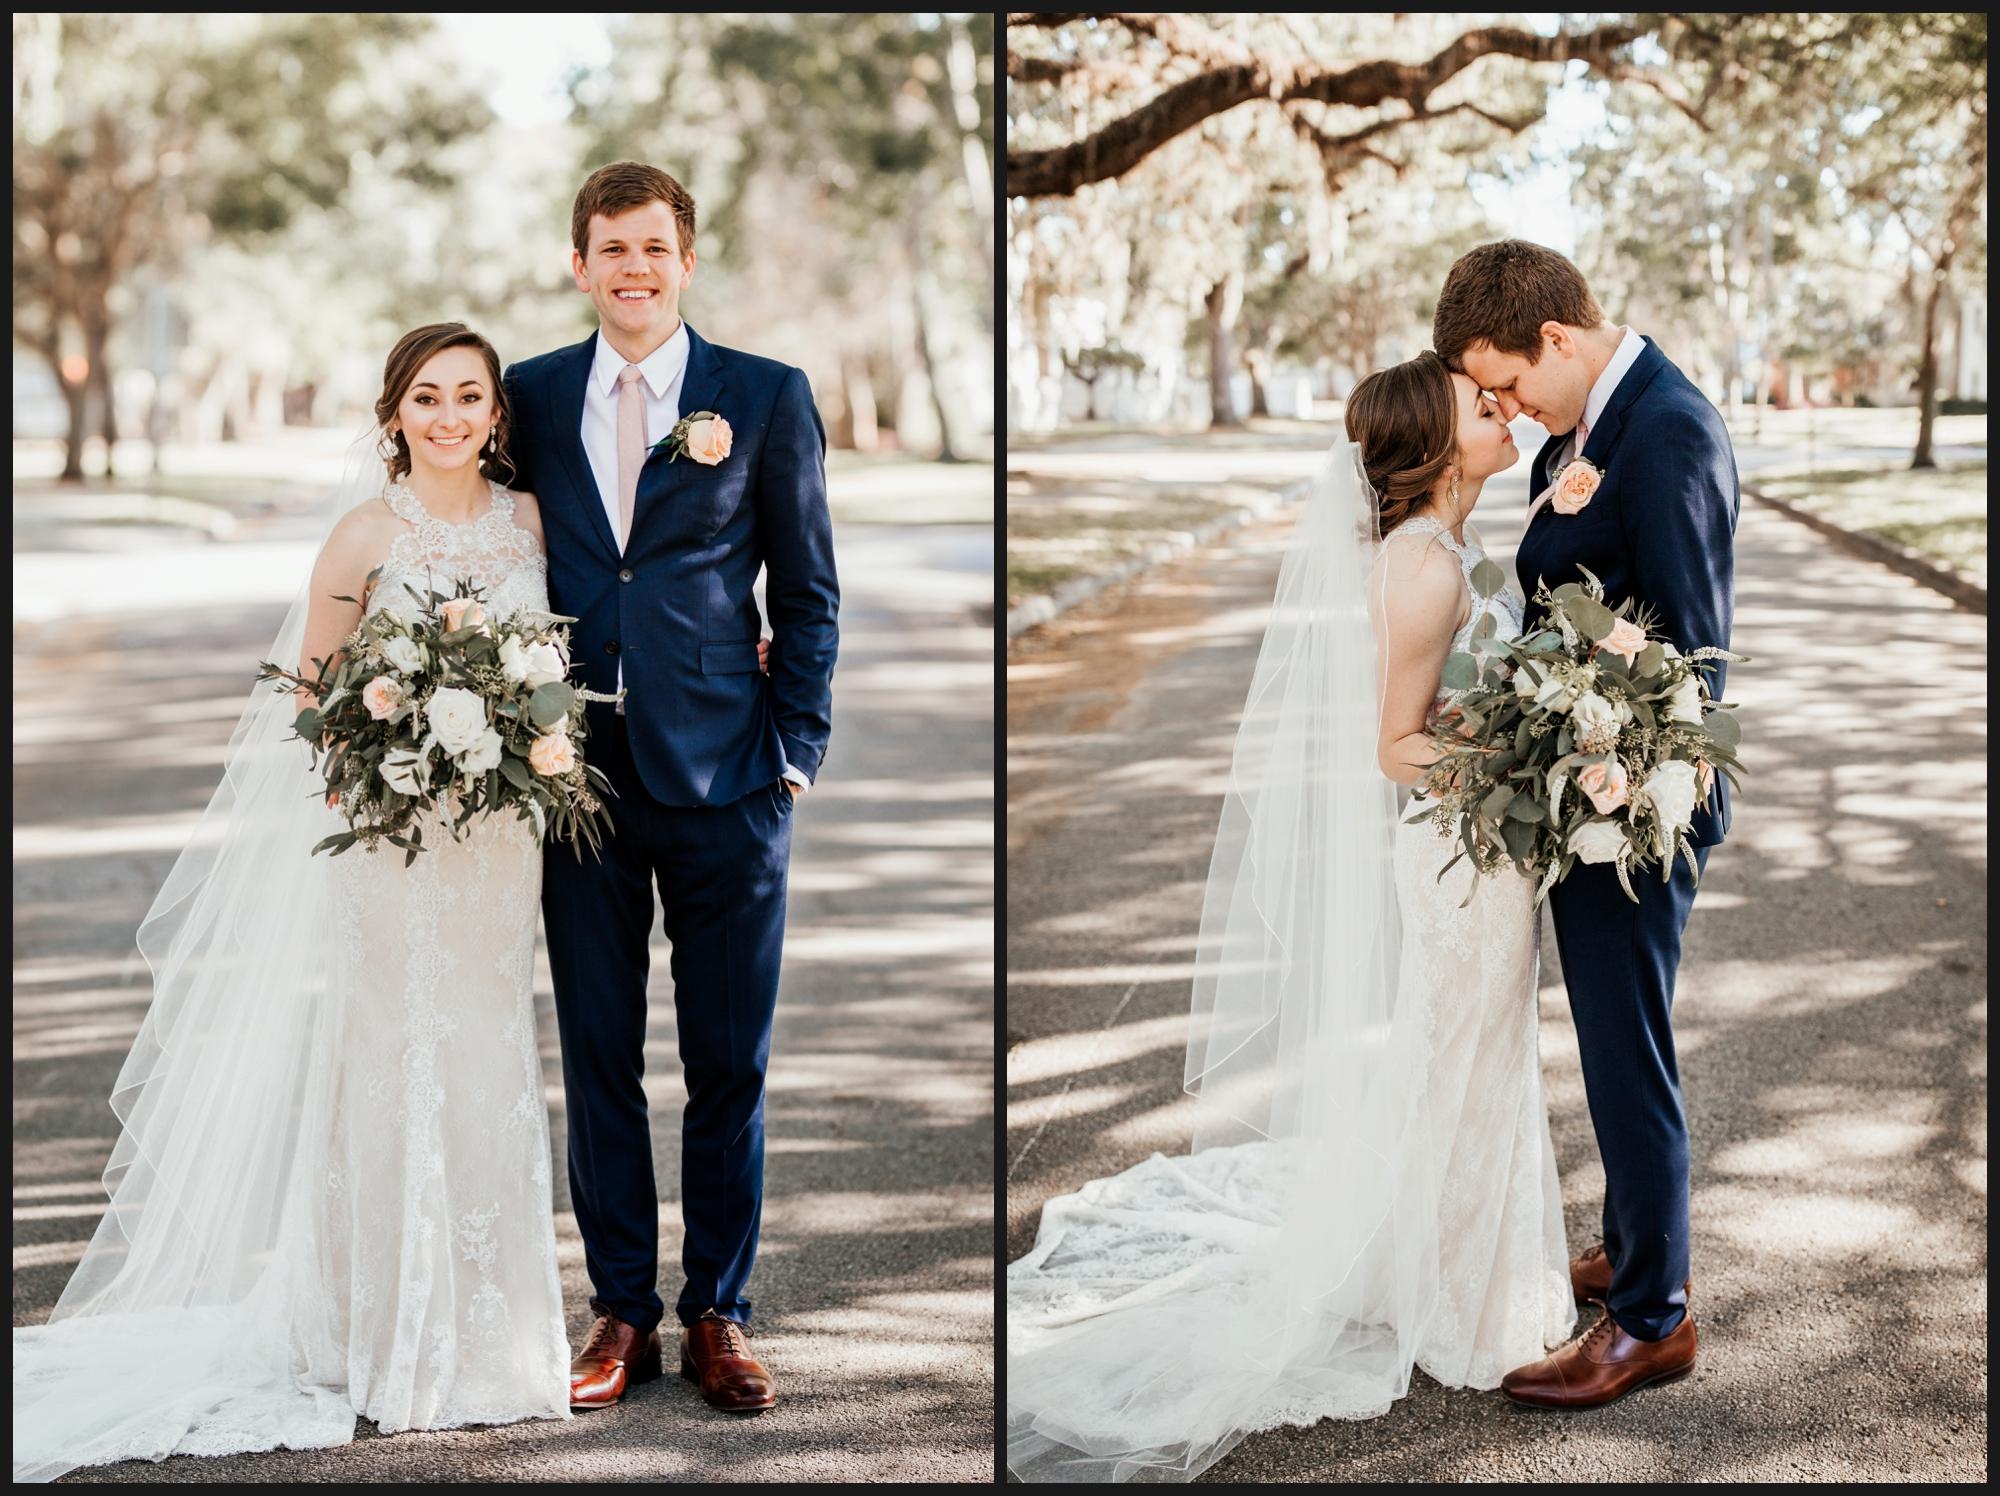 Orlando-Wedding-Photographer-destination-wedding-photographer-florida-wedding-photographer-bohemian-wedding-photographer_1693.jpg